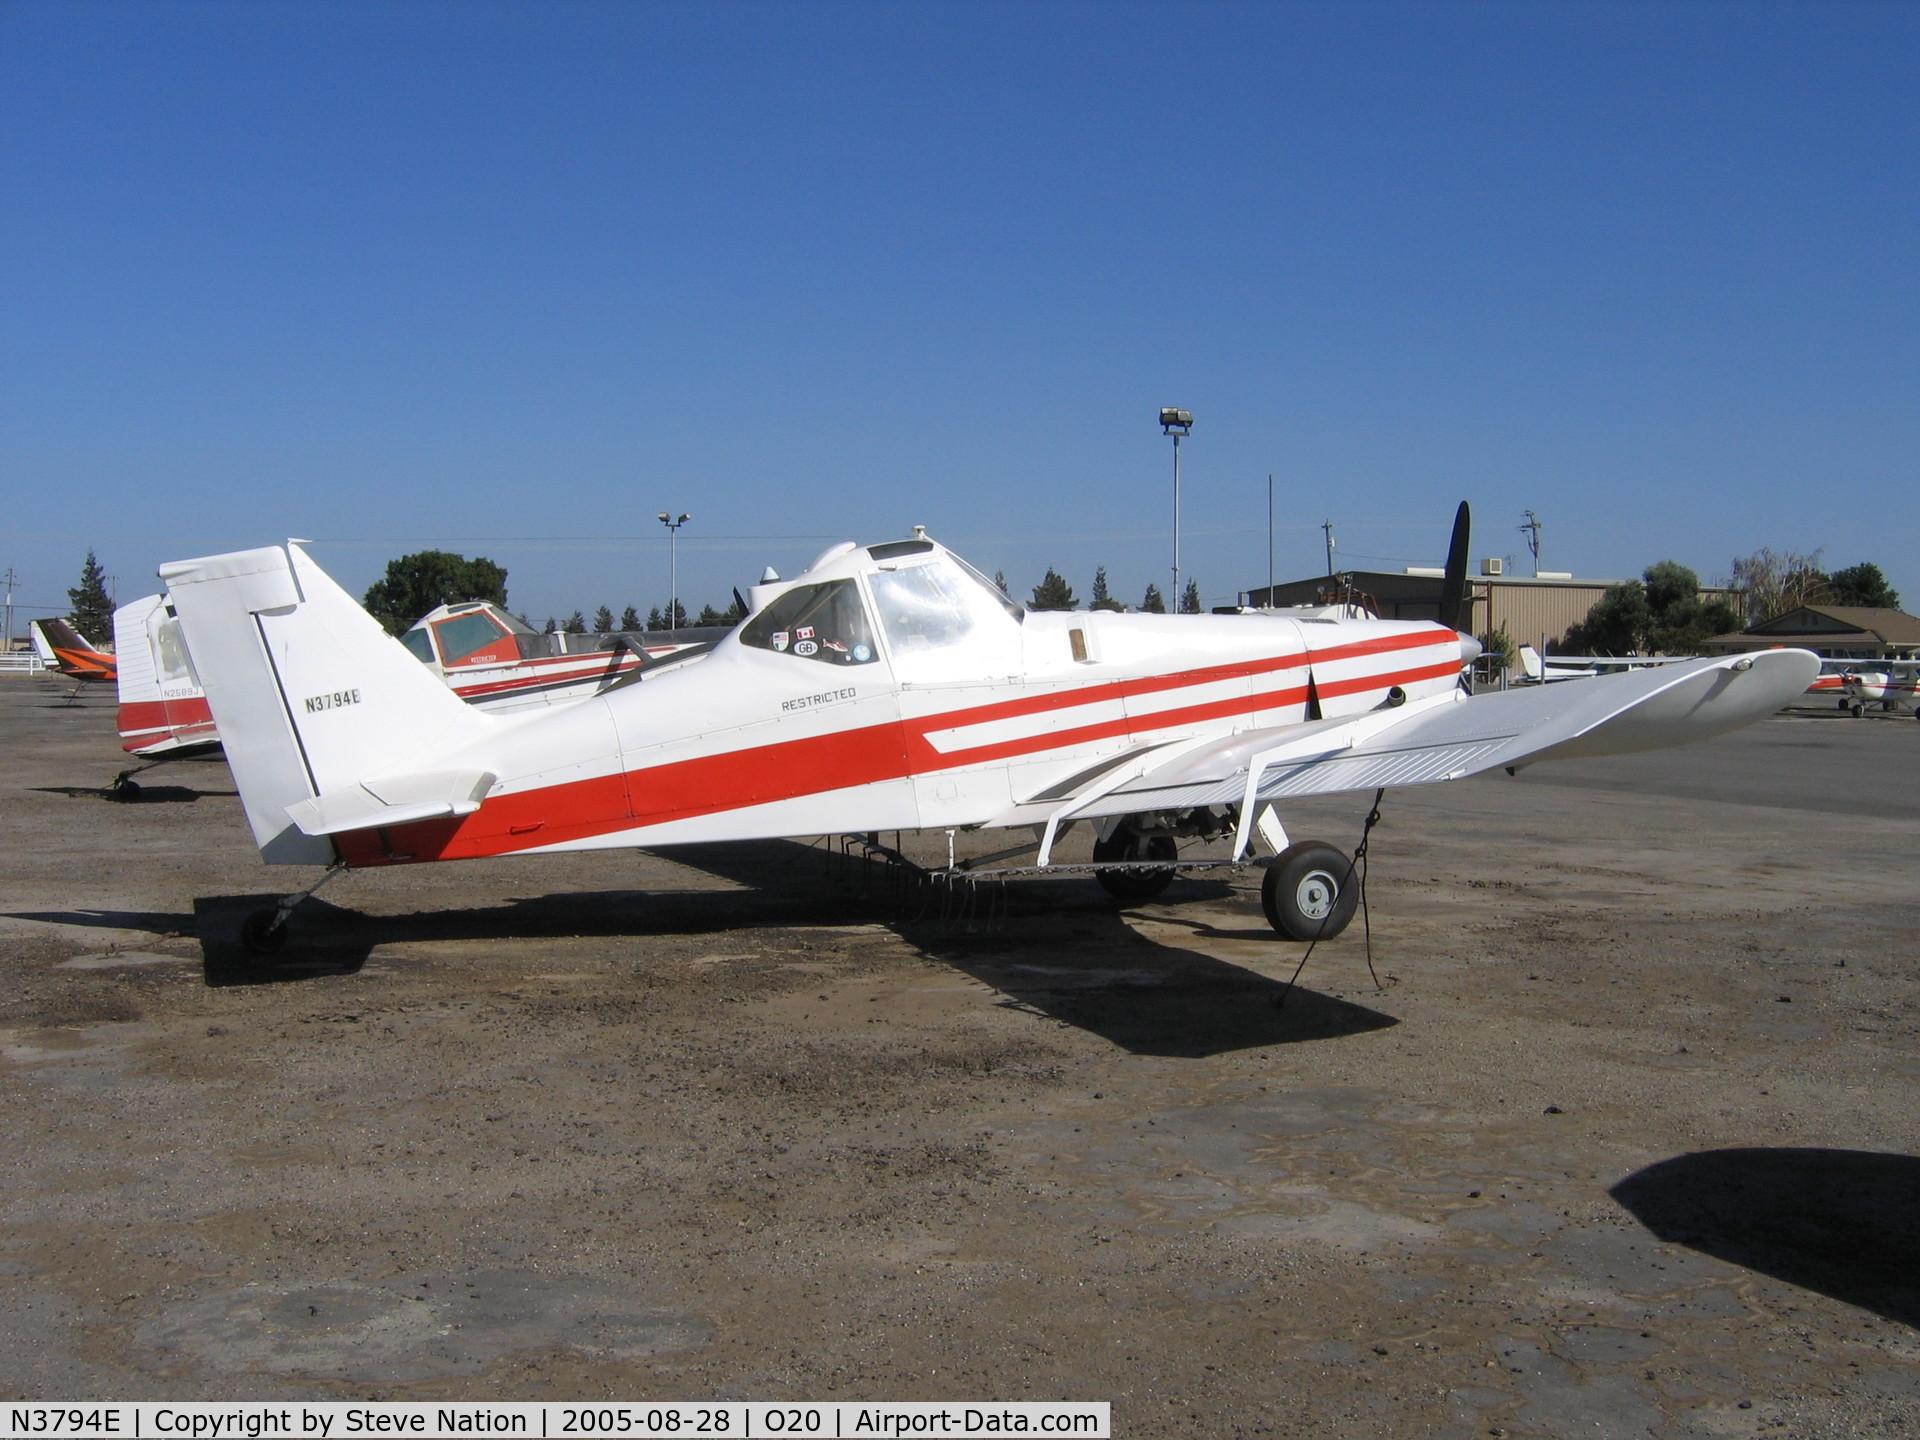 N3794E, 1978 Piper PA-36-375 Brave 375 C/N 36-7802003, San Joaquin Air 1978 Piper PA-36-375 Brave rigged as sprayer @ Lodi-Kingdon Airport, CA